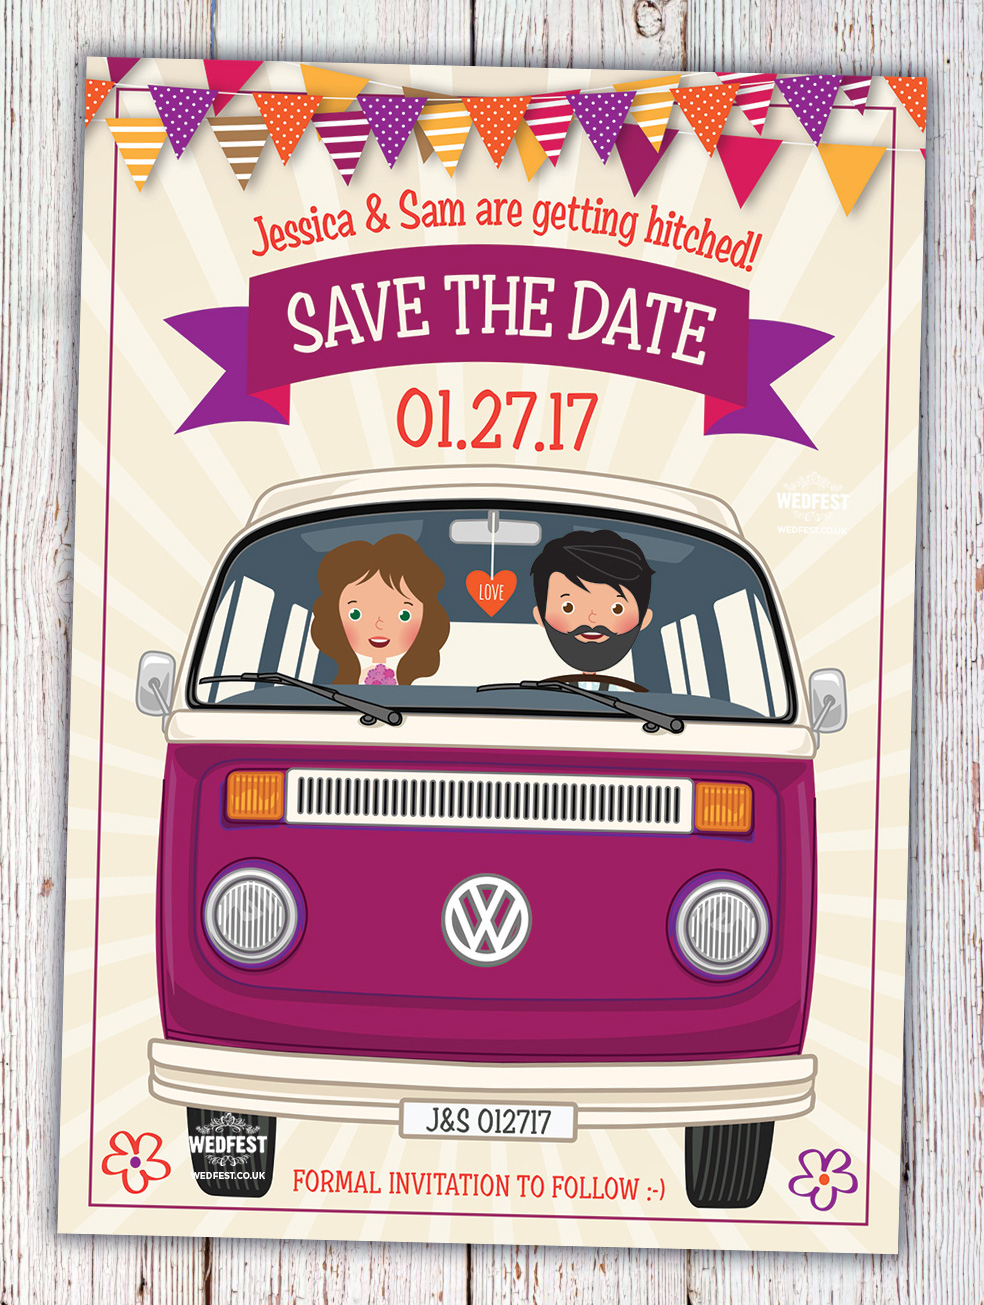 vw camper van festival wedding save the date cards